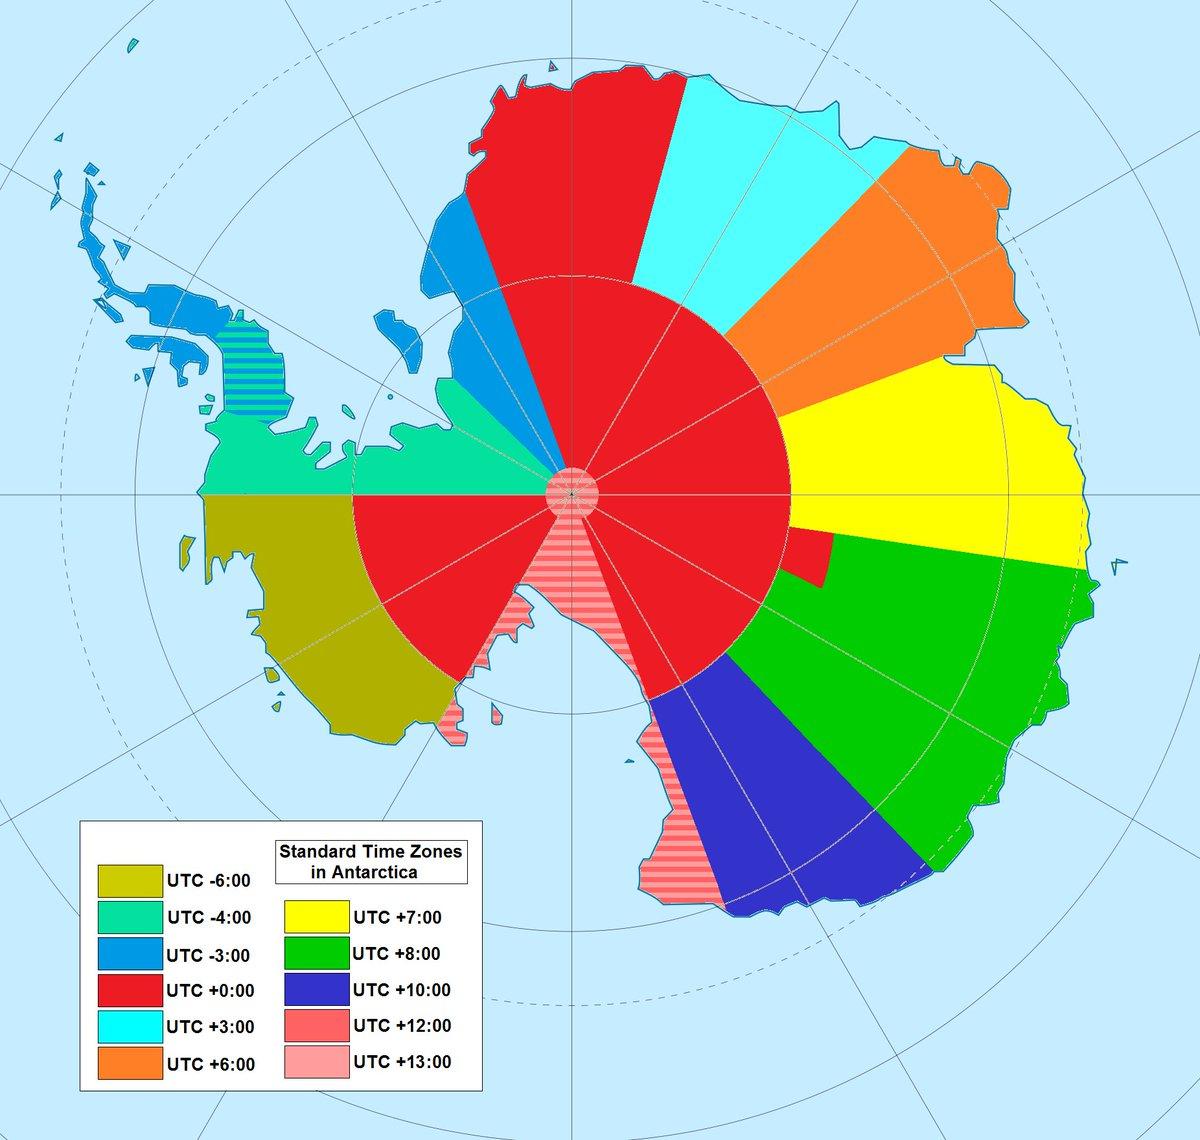 Is this what permanent jet lag looks like? #Antarctica #TimeZones <br>http://pic.twitter.com/SHrtO8ztZt